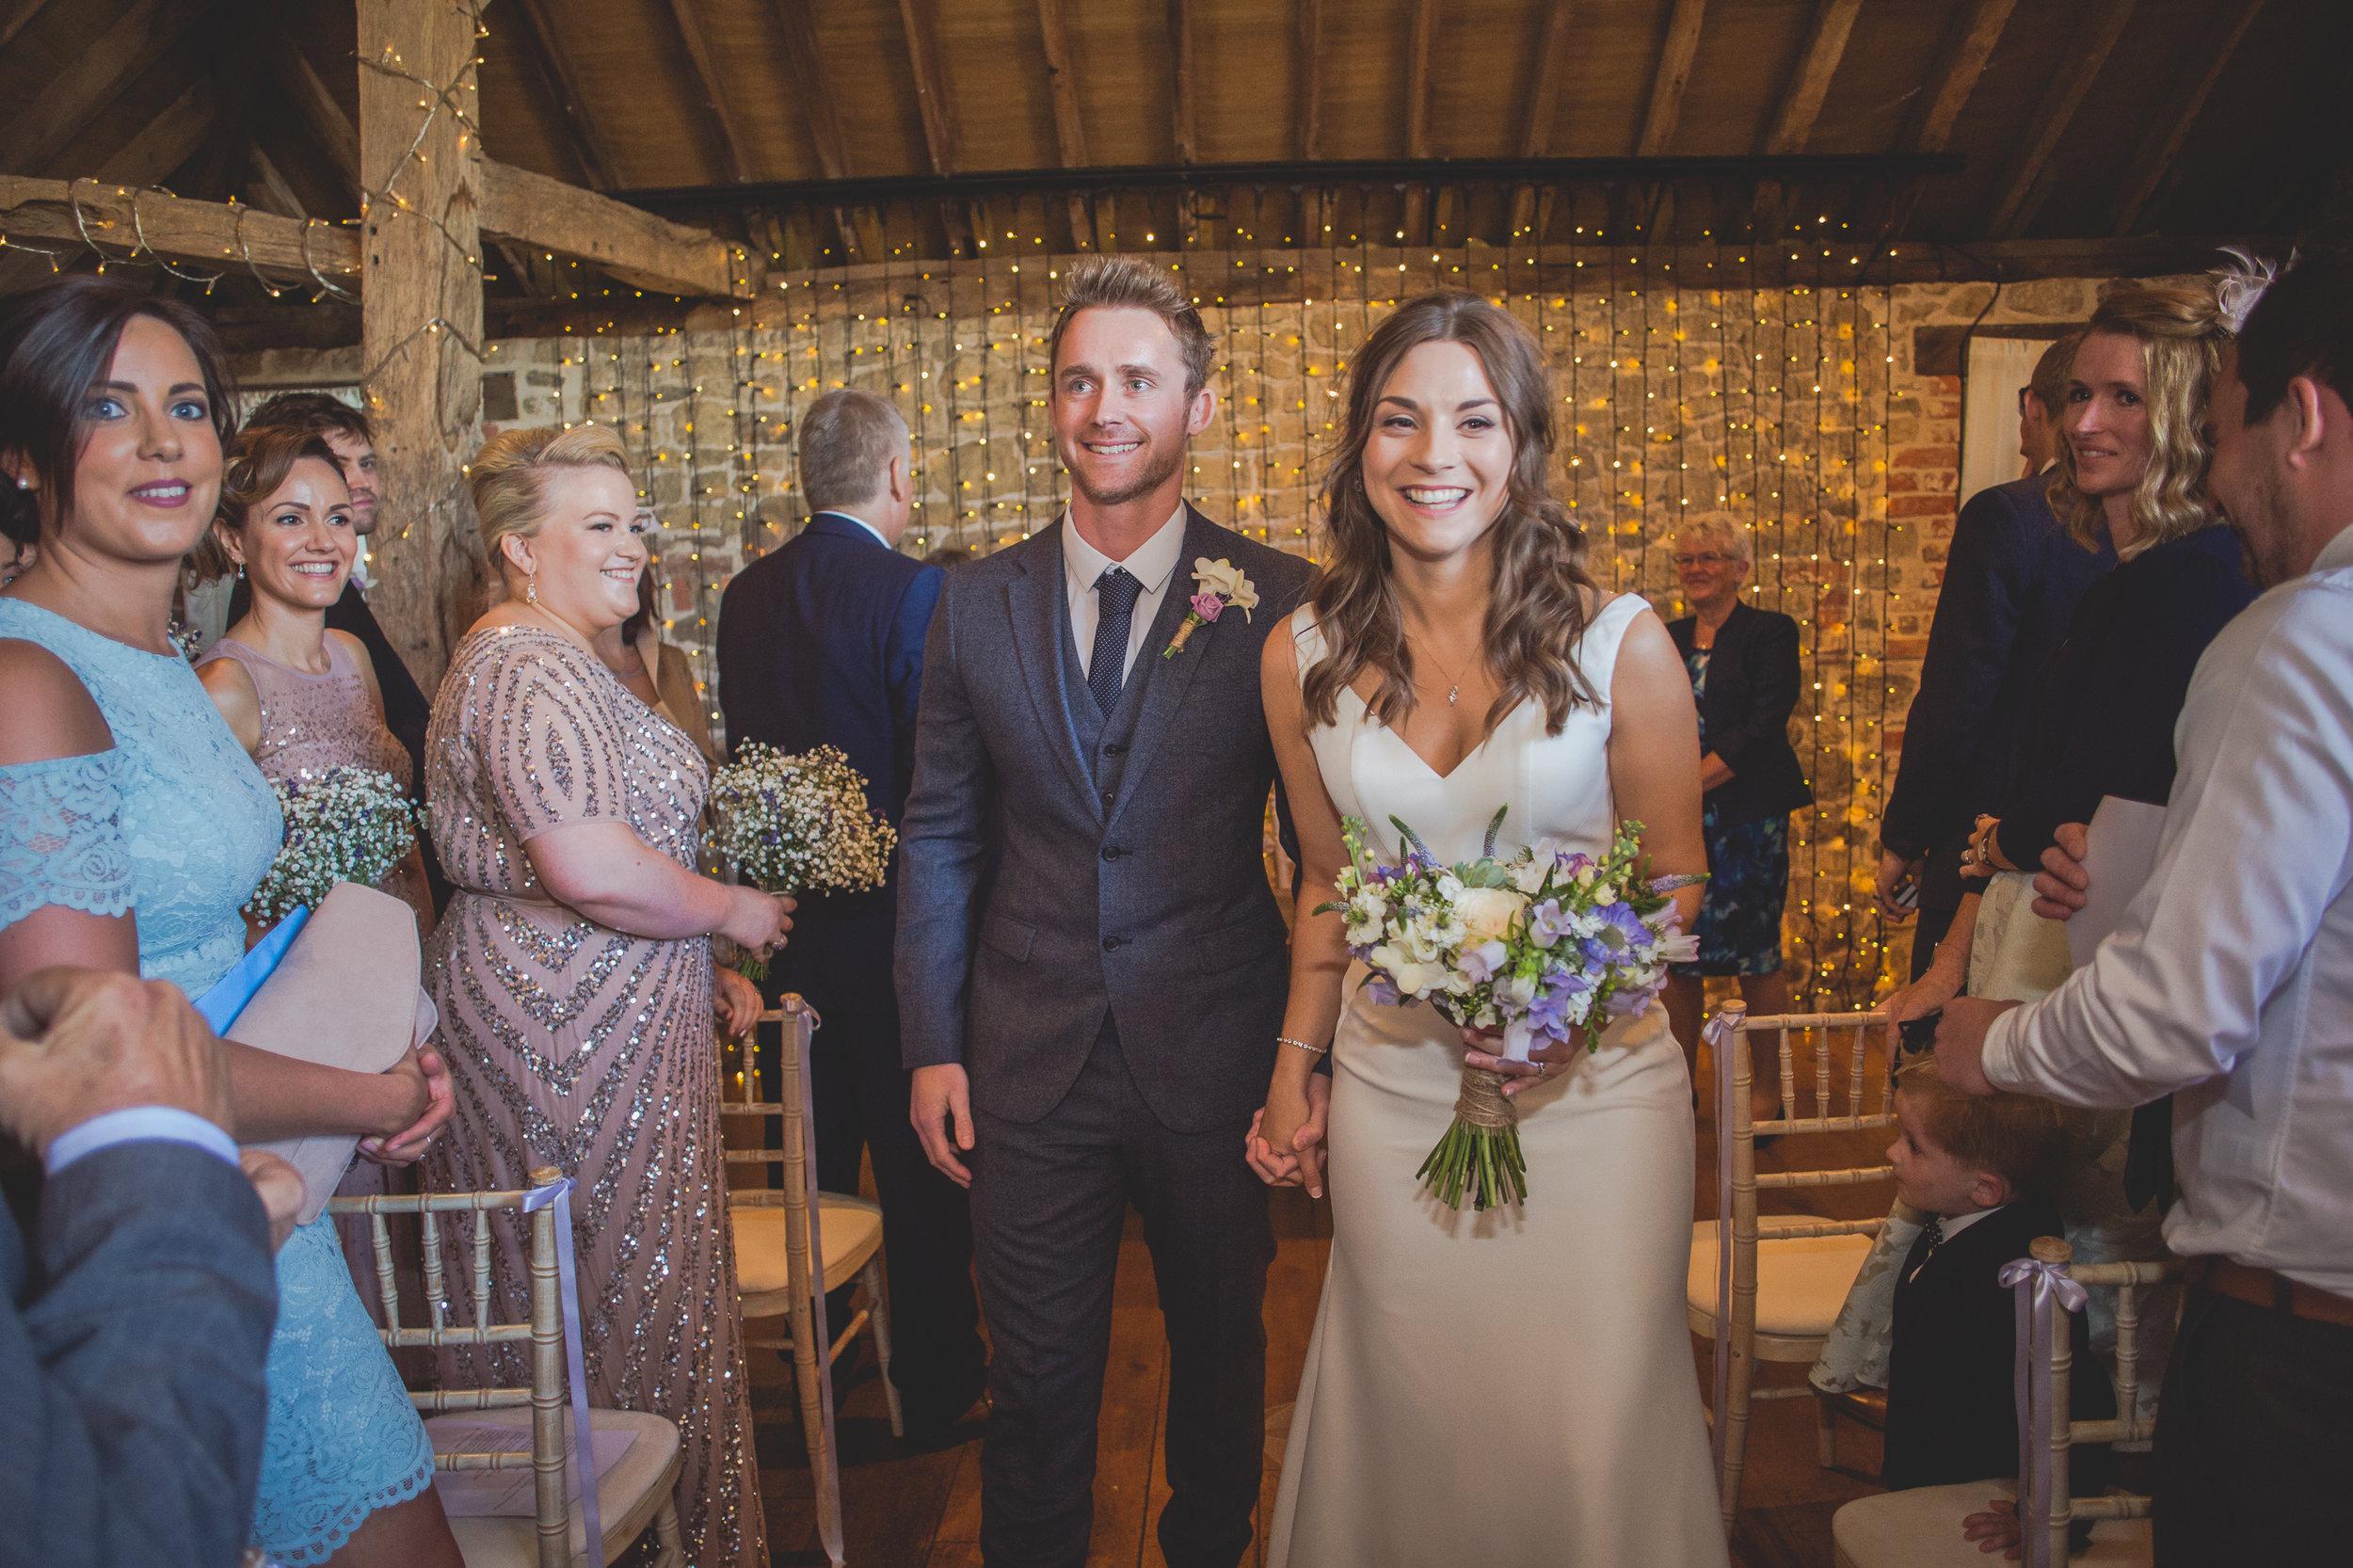 Grittenham Barn female wedding photographers west sussex petworth social-69.jpg